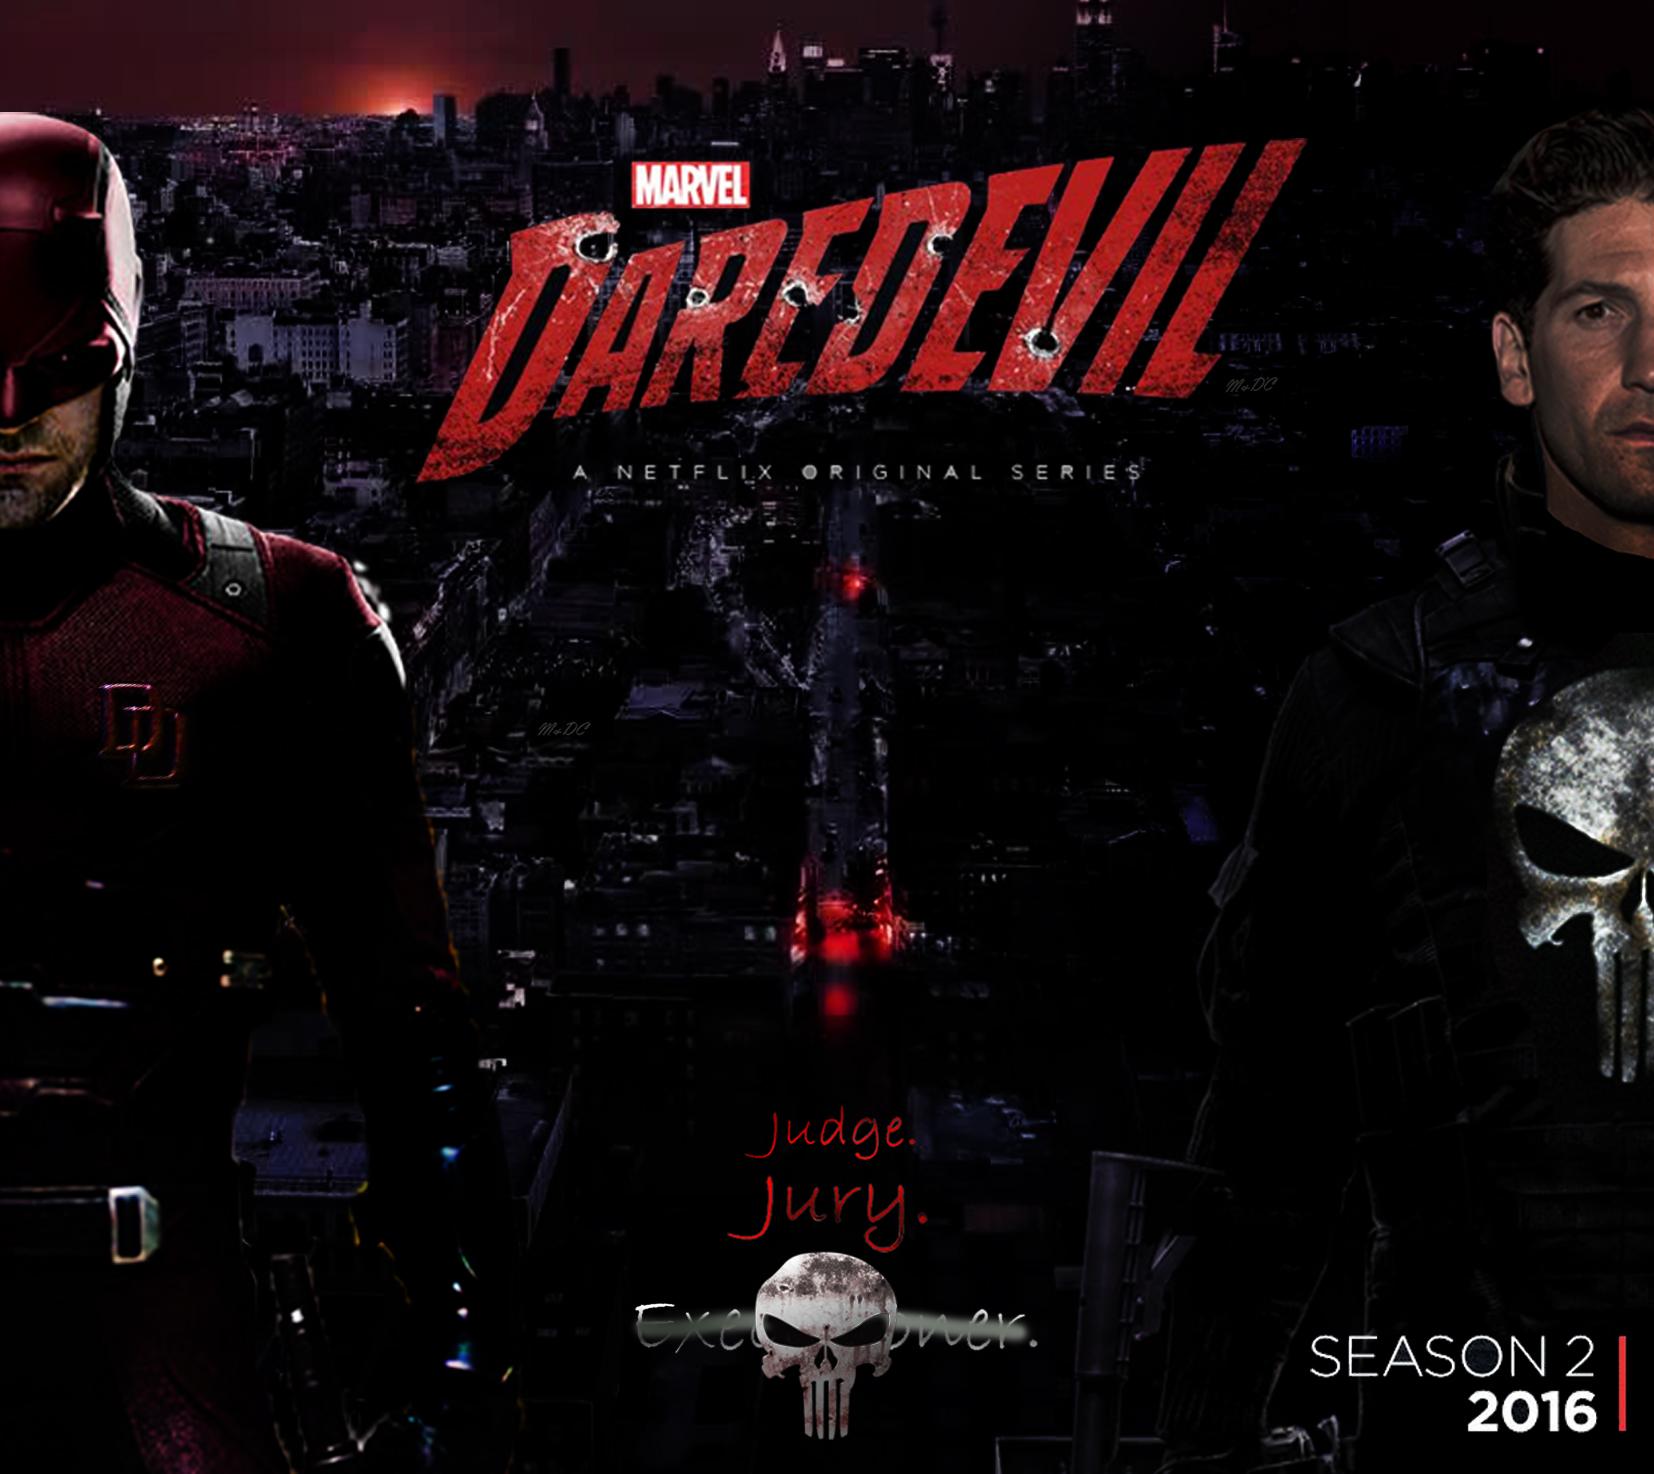 Marvels Daredevil Season 2 Punisher Promo By Fmirza95 On DeviantArt